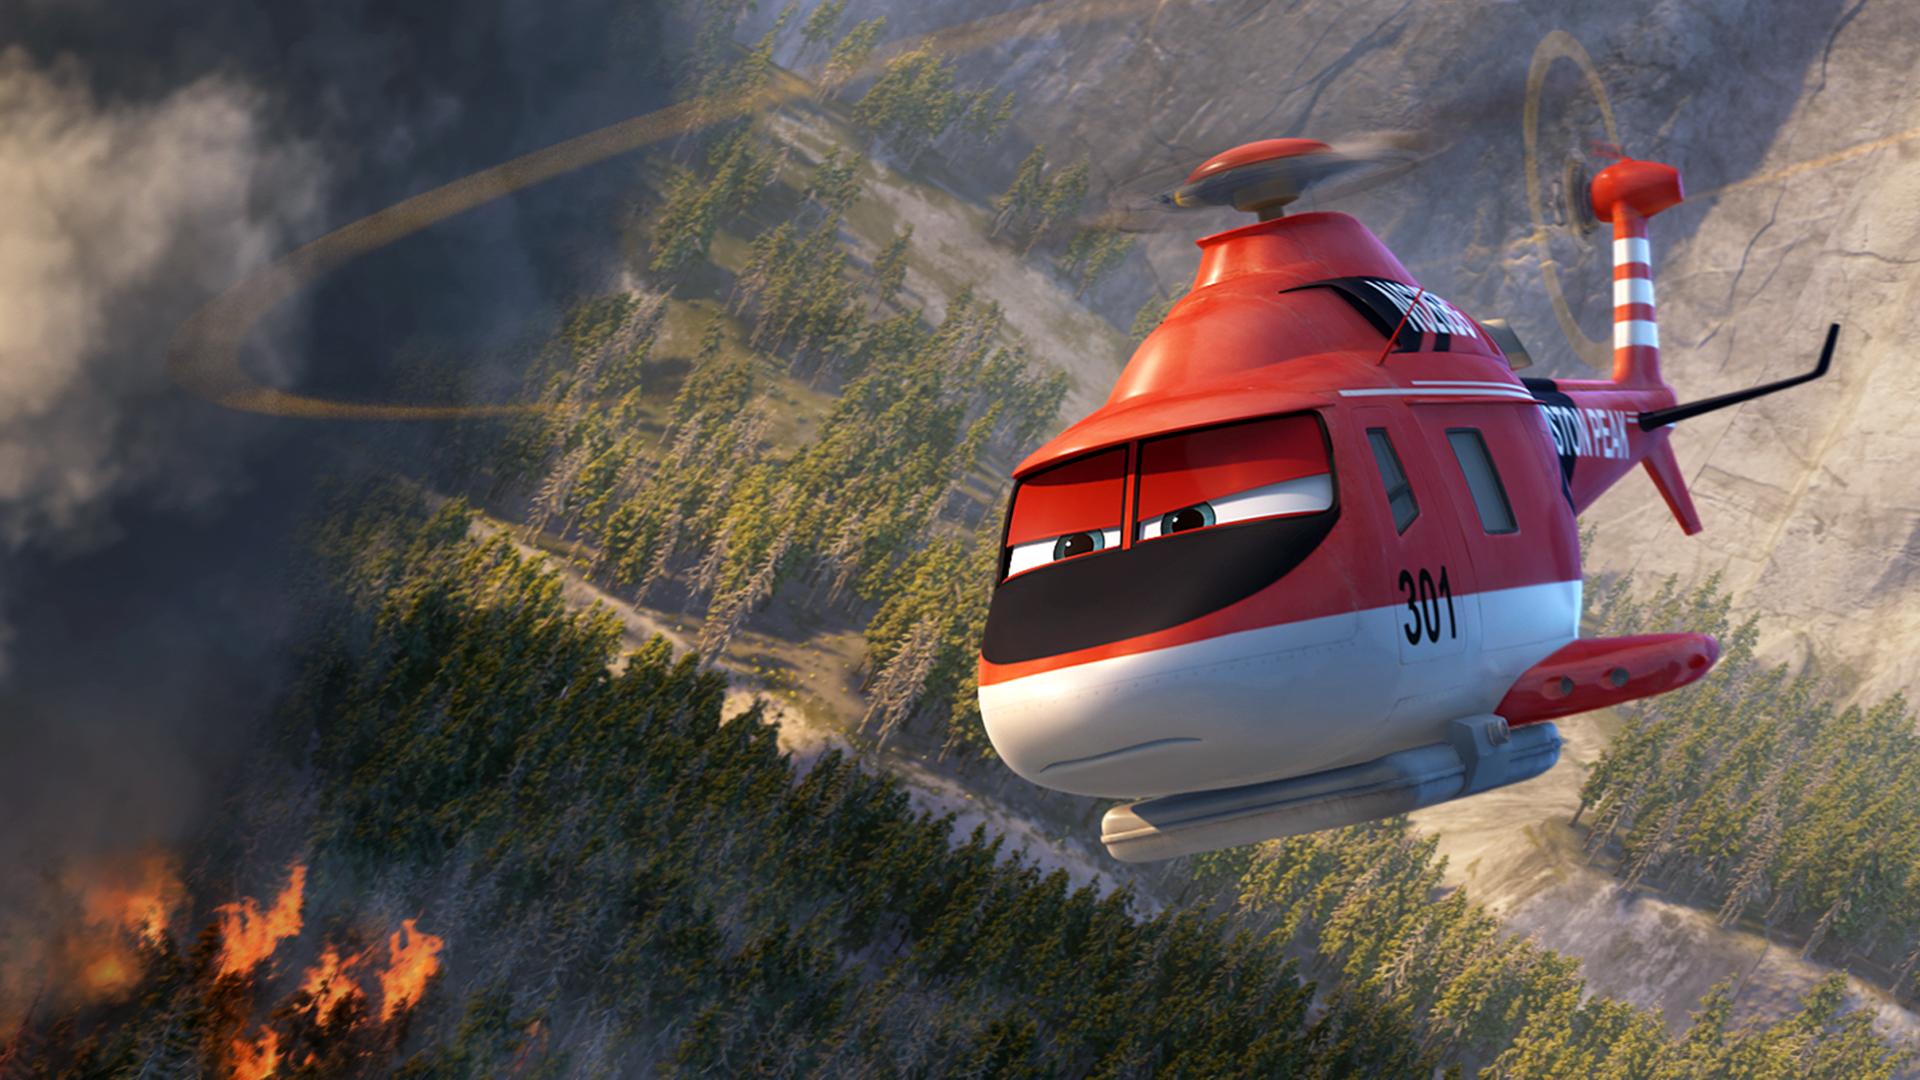 Planes Fire Rescue Blade Ranger Wallpaper HD